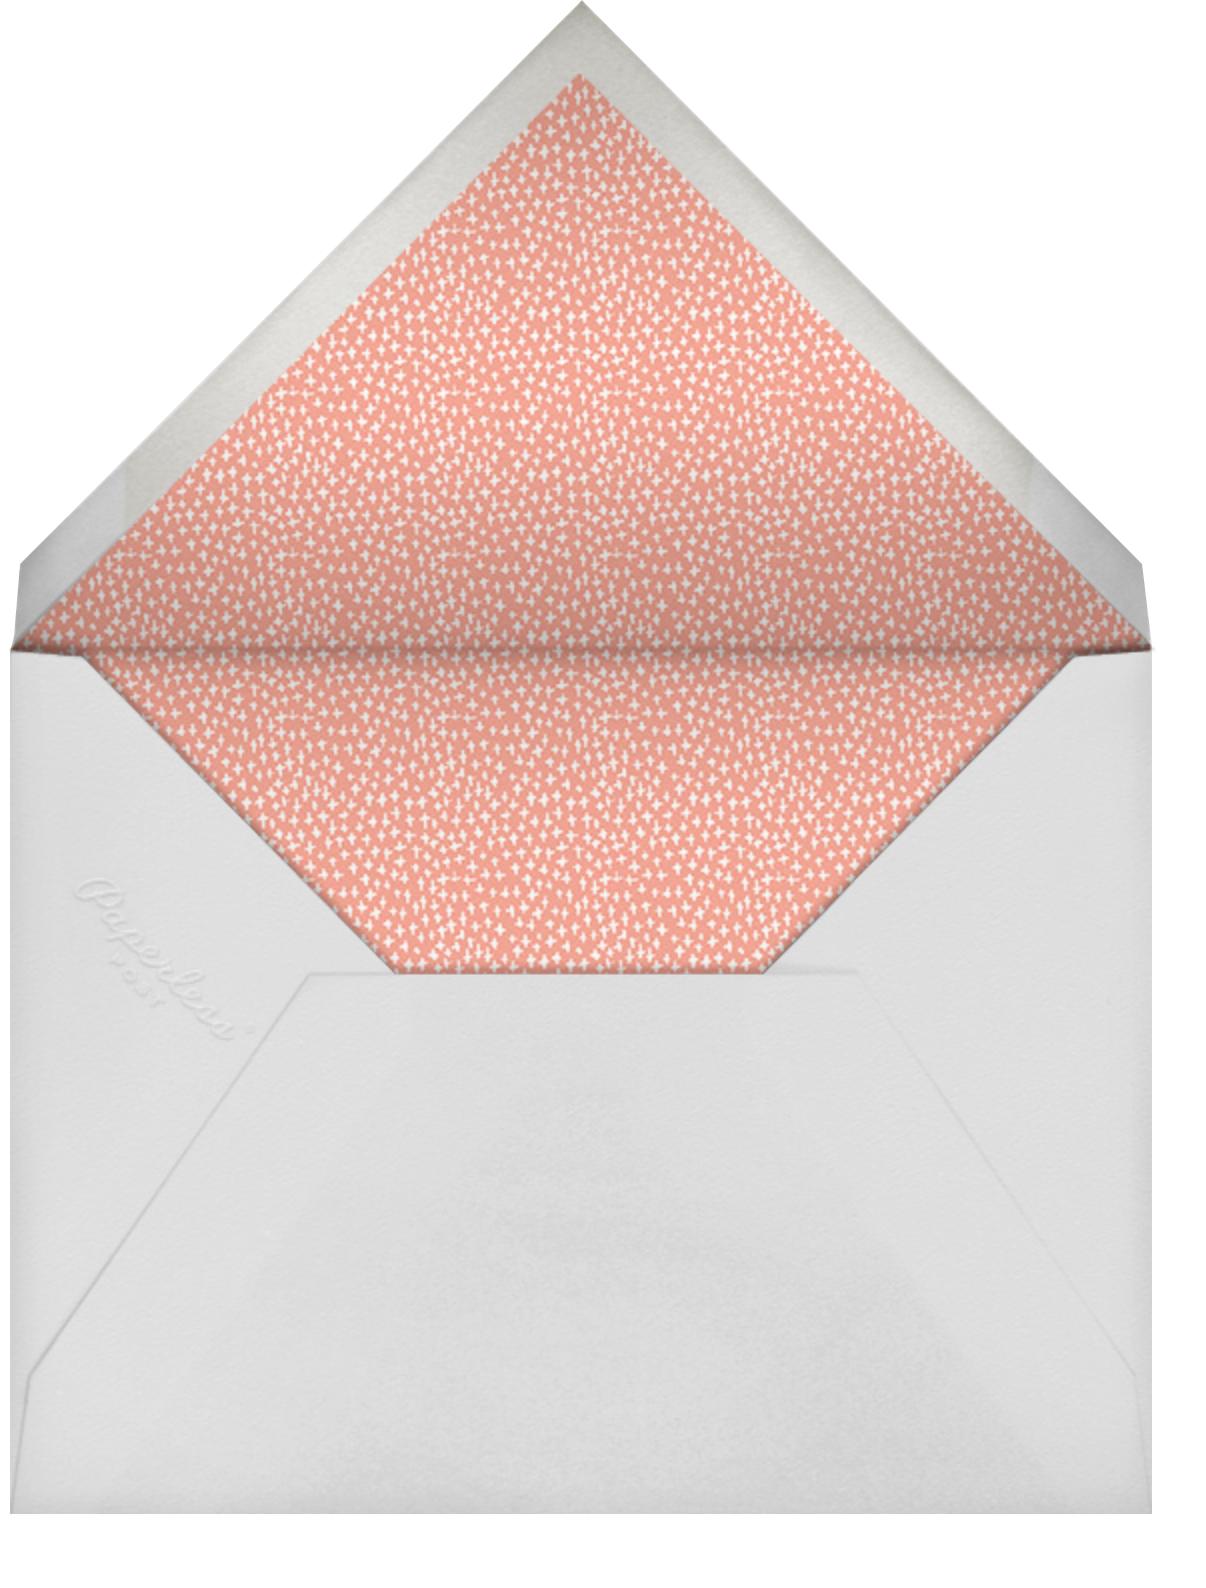 Le Joli Mai - Mr. Boddington's Studio - Baby shower - envelope back